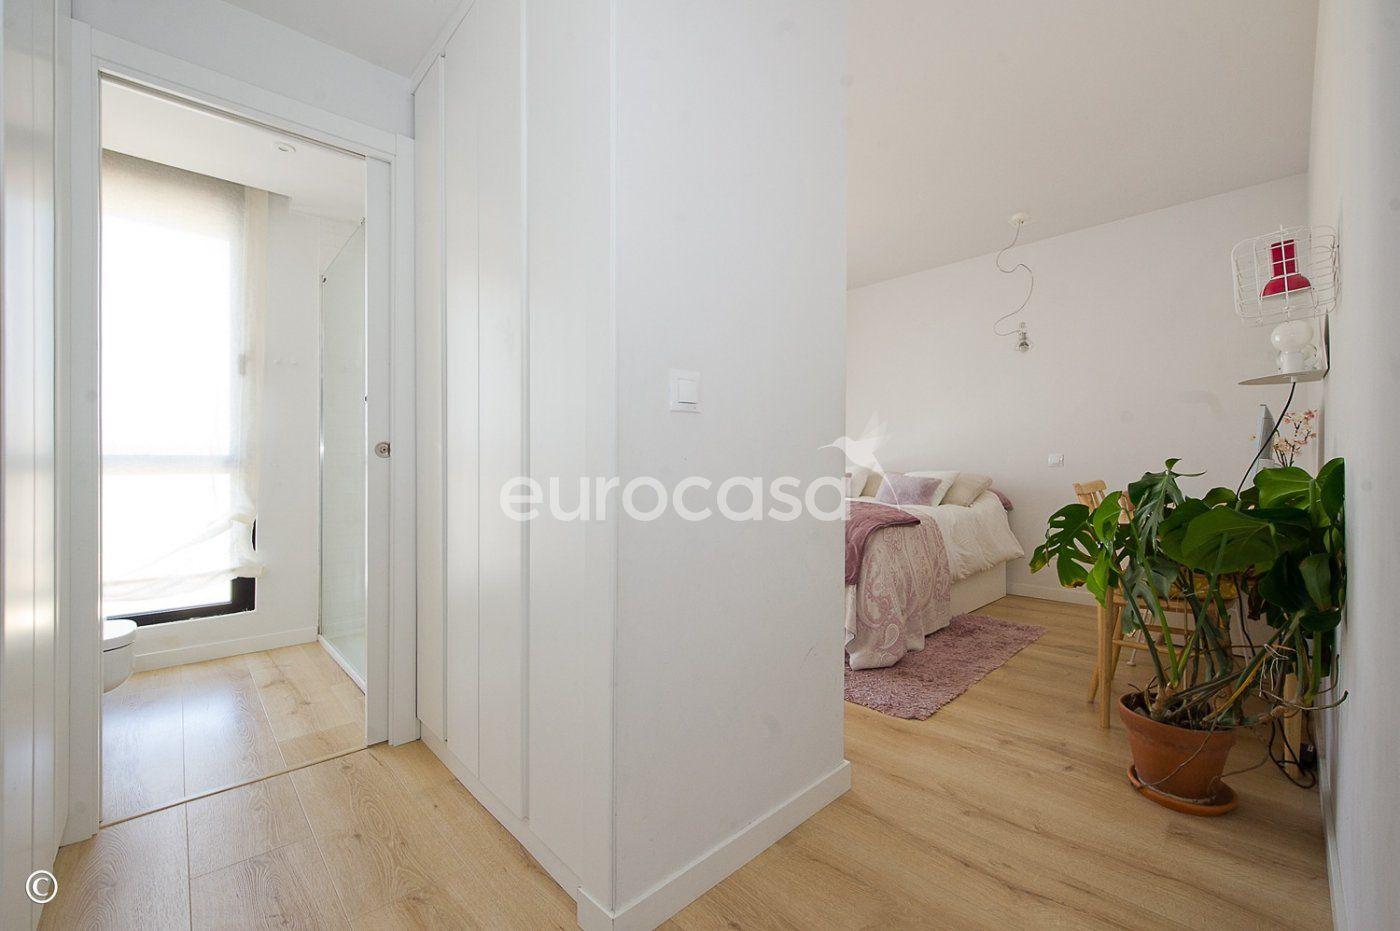 Piso · Santander · San Roman 352.000€€